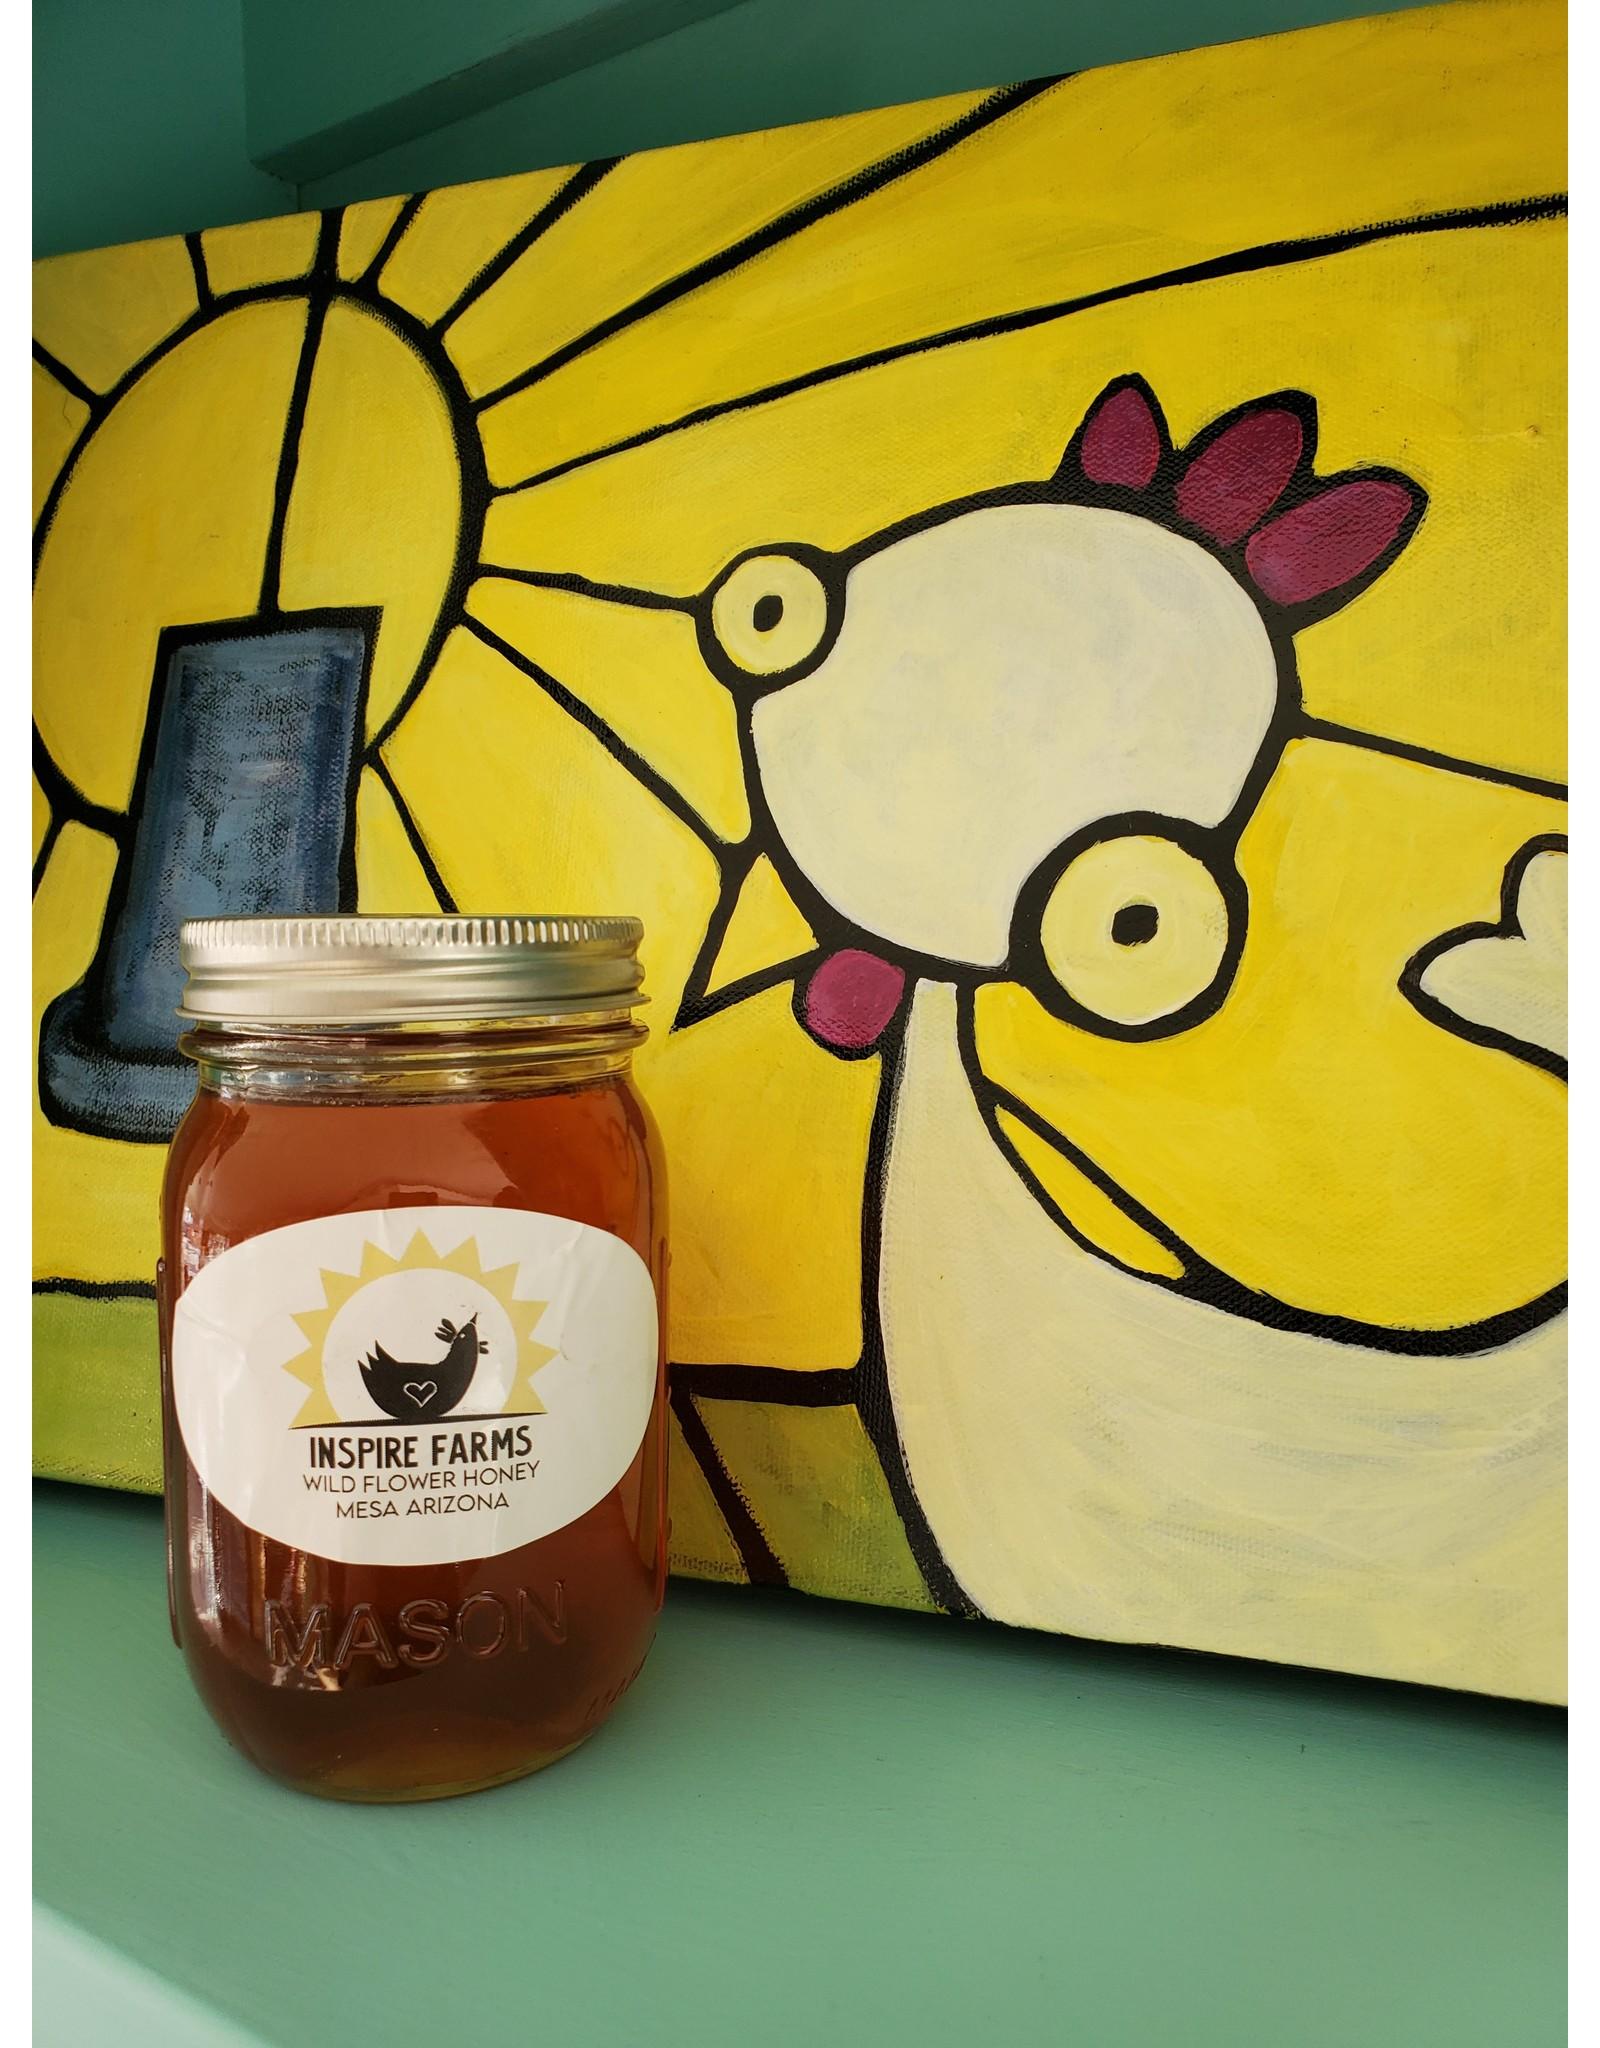 Inspire Farms Wild Honey